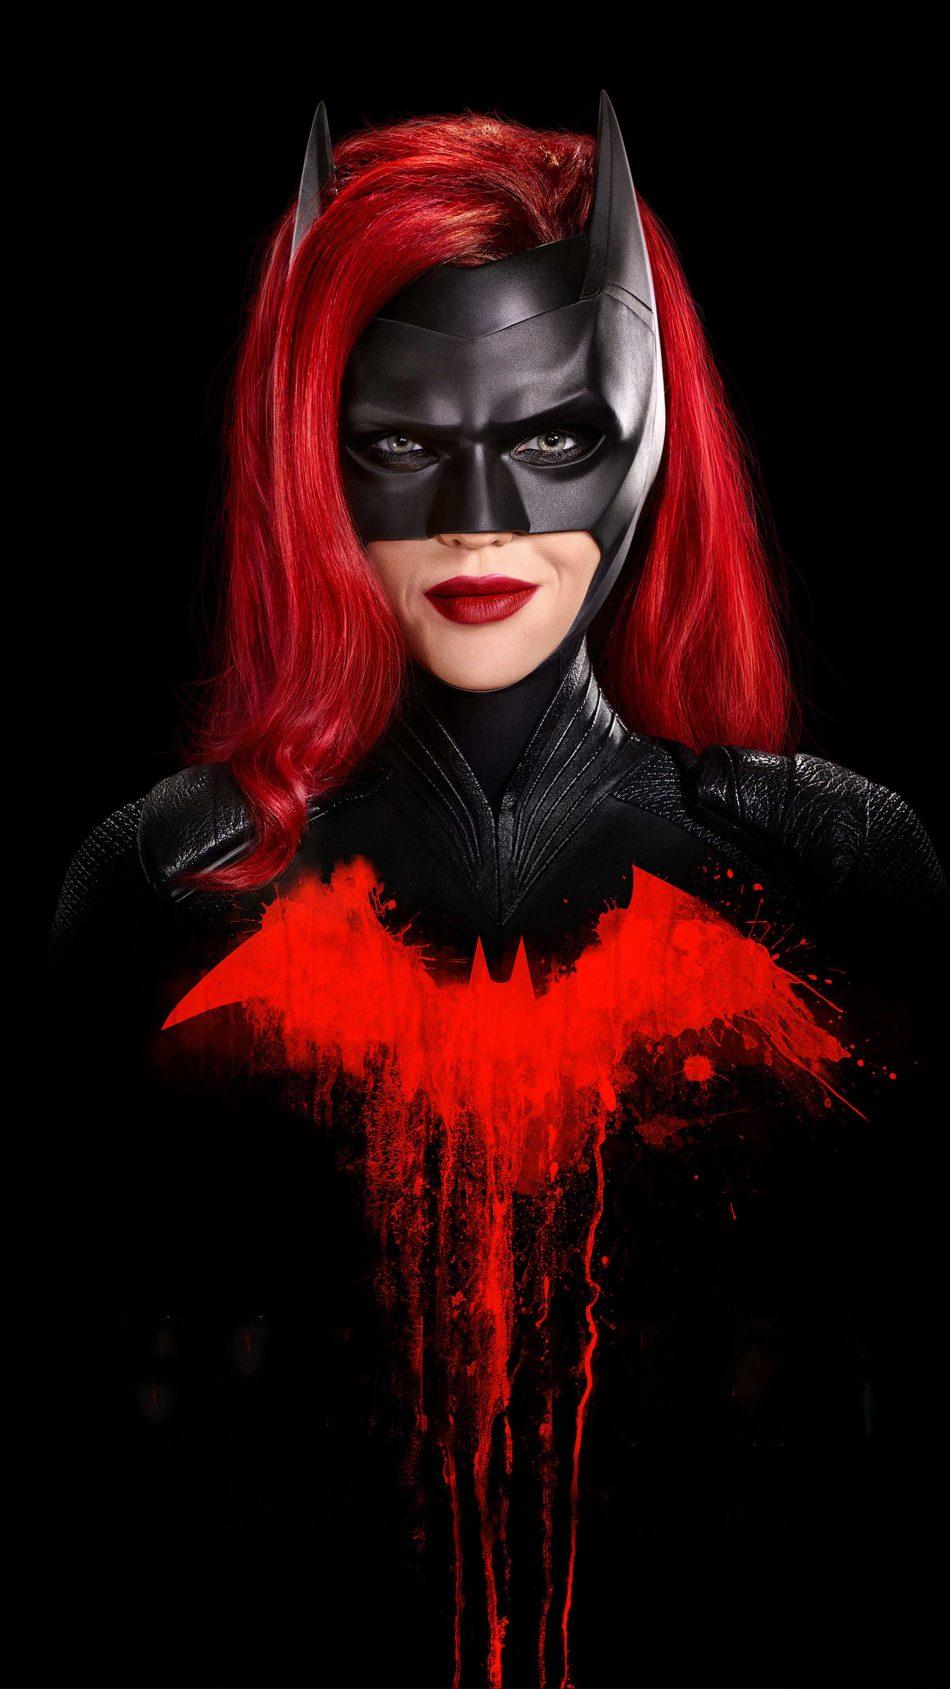 Batwoman Dark Background 4K Ultra HD Mobile Wallpaper